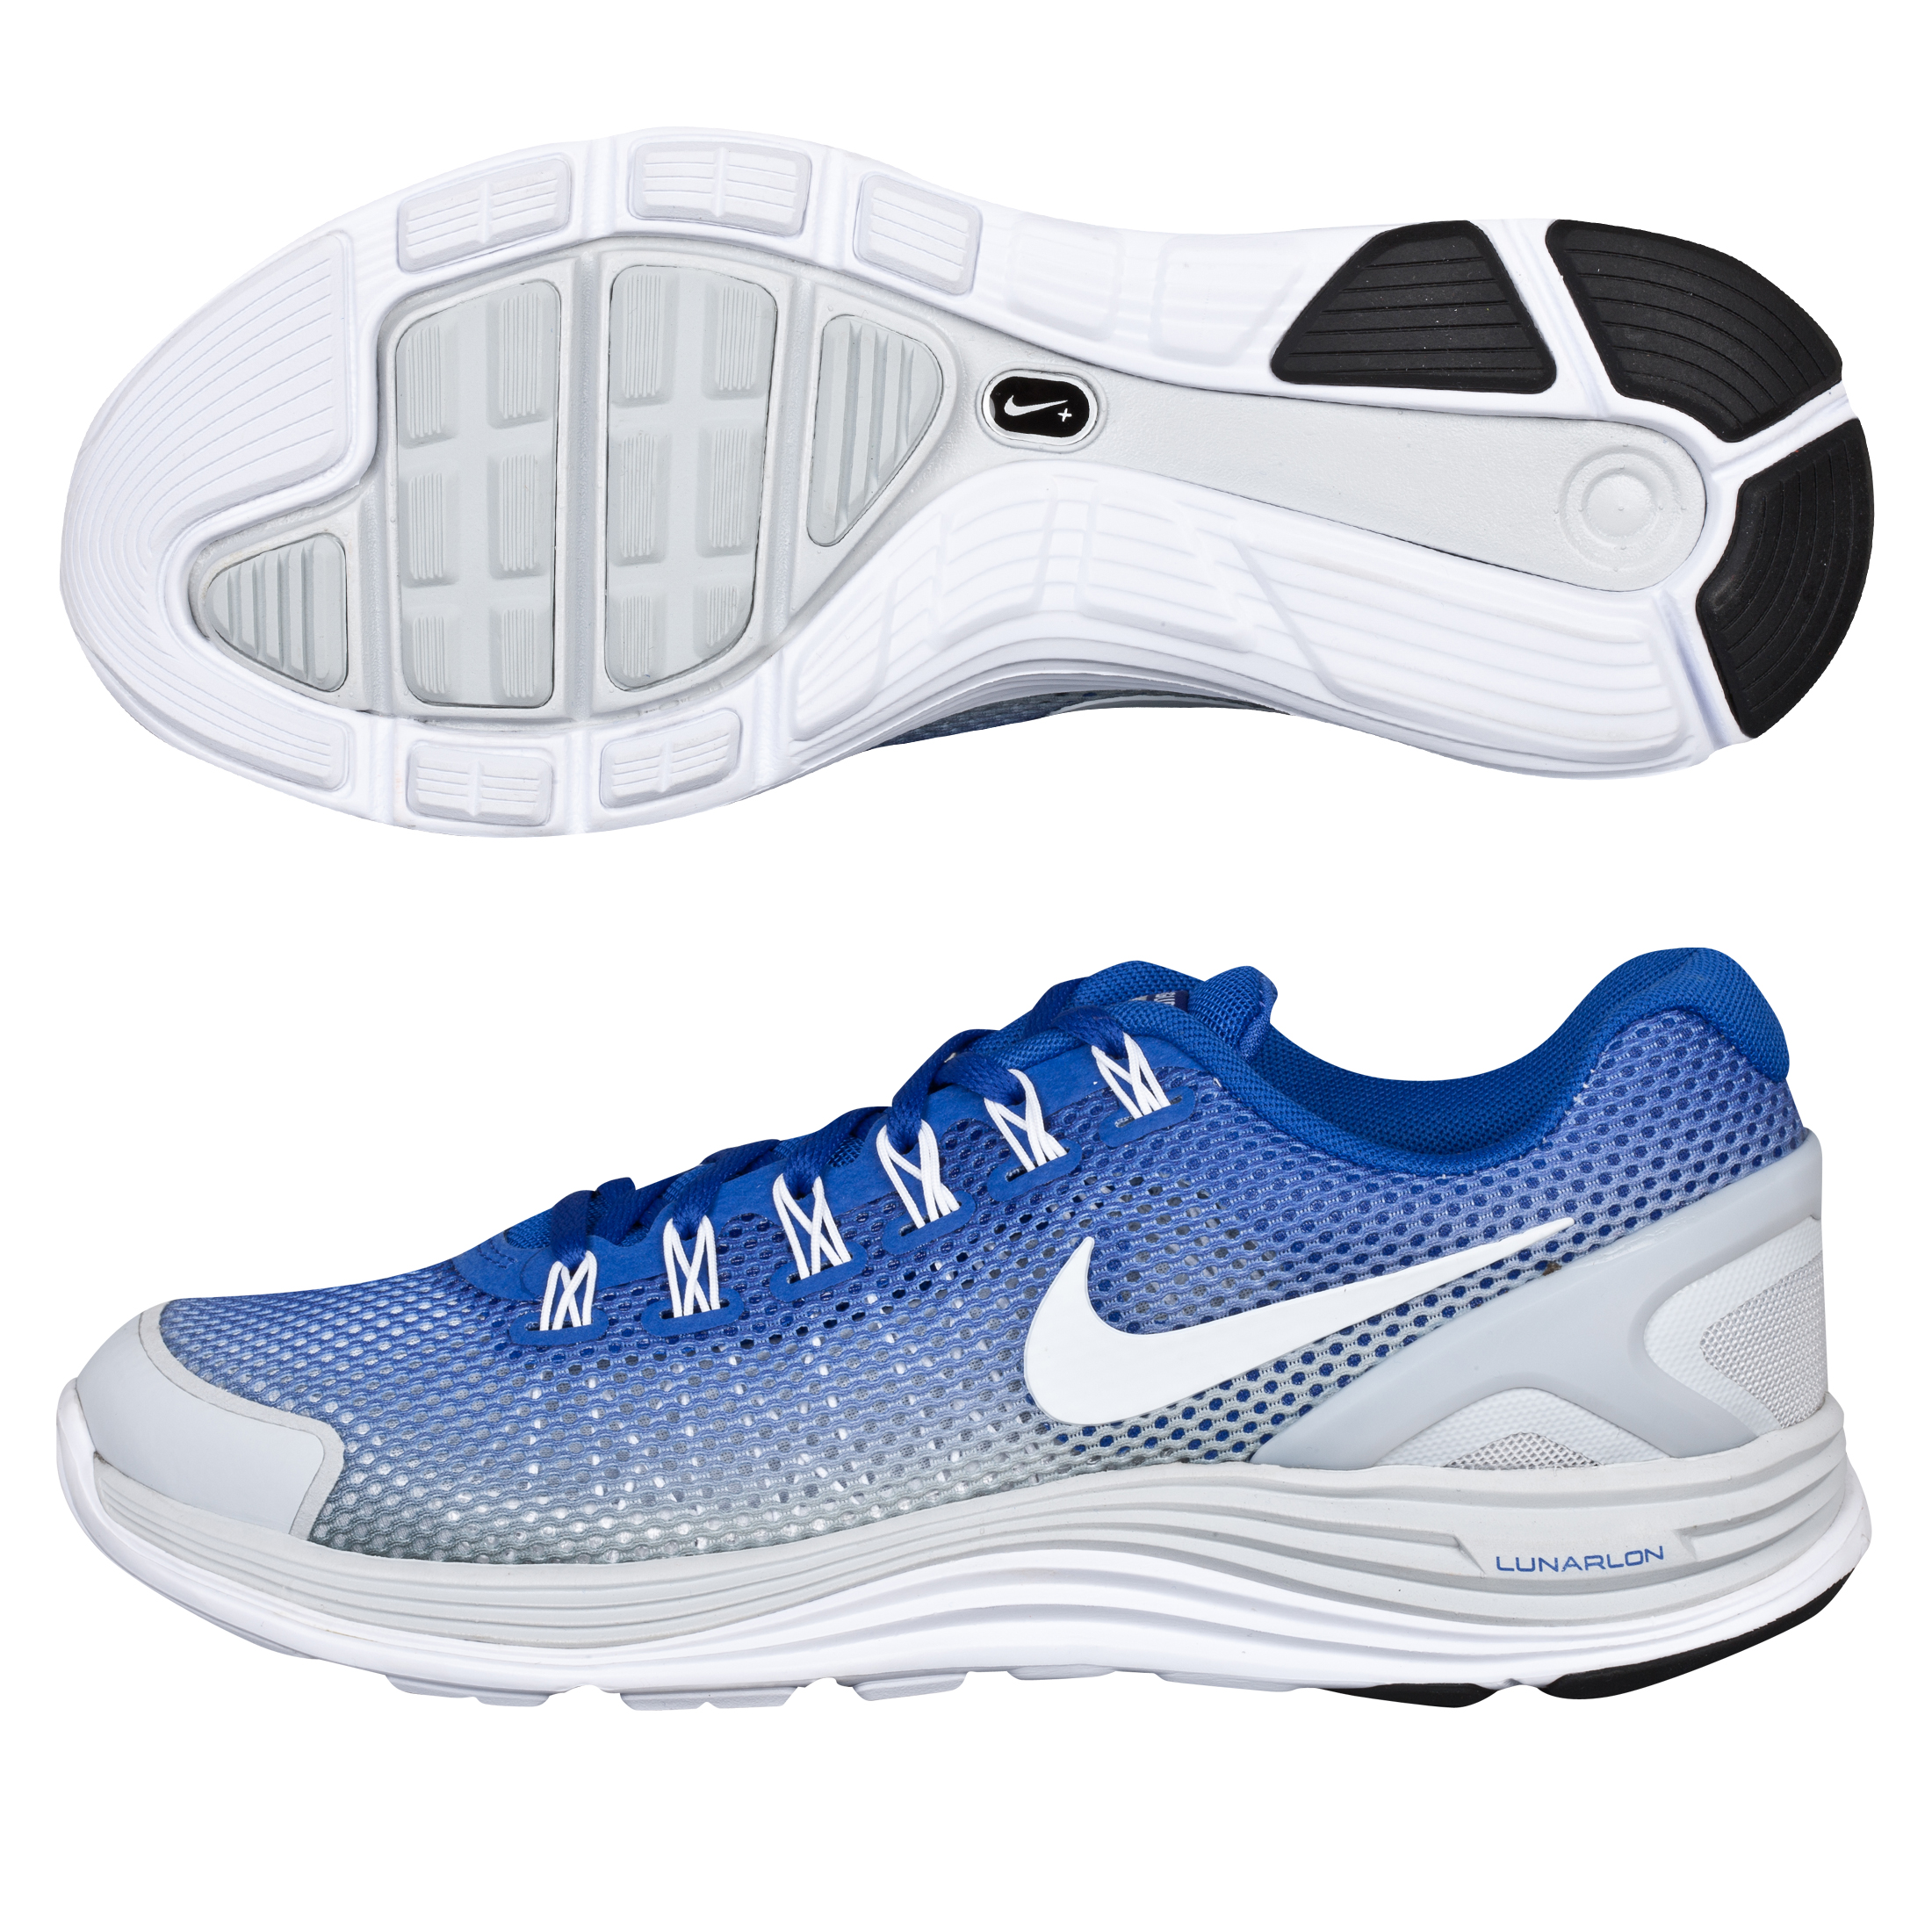 Nike Lunarglide+ 4 (Breathe) Trainer - Hyper Blue/ White Pure Platinum